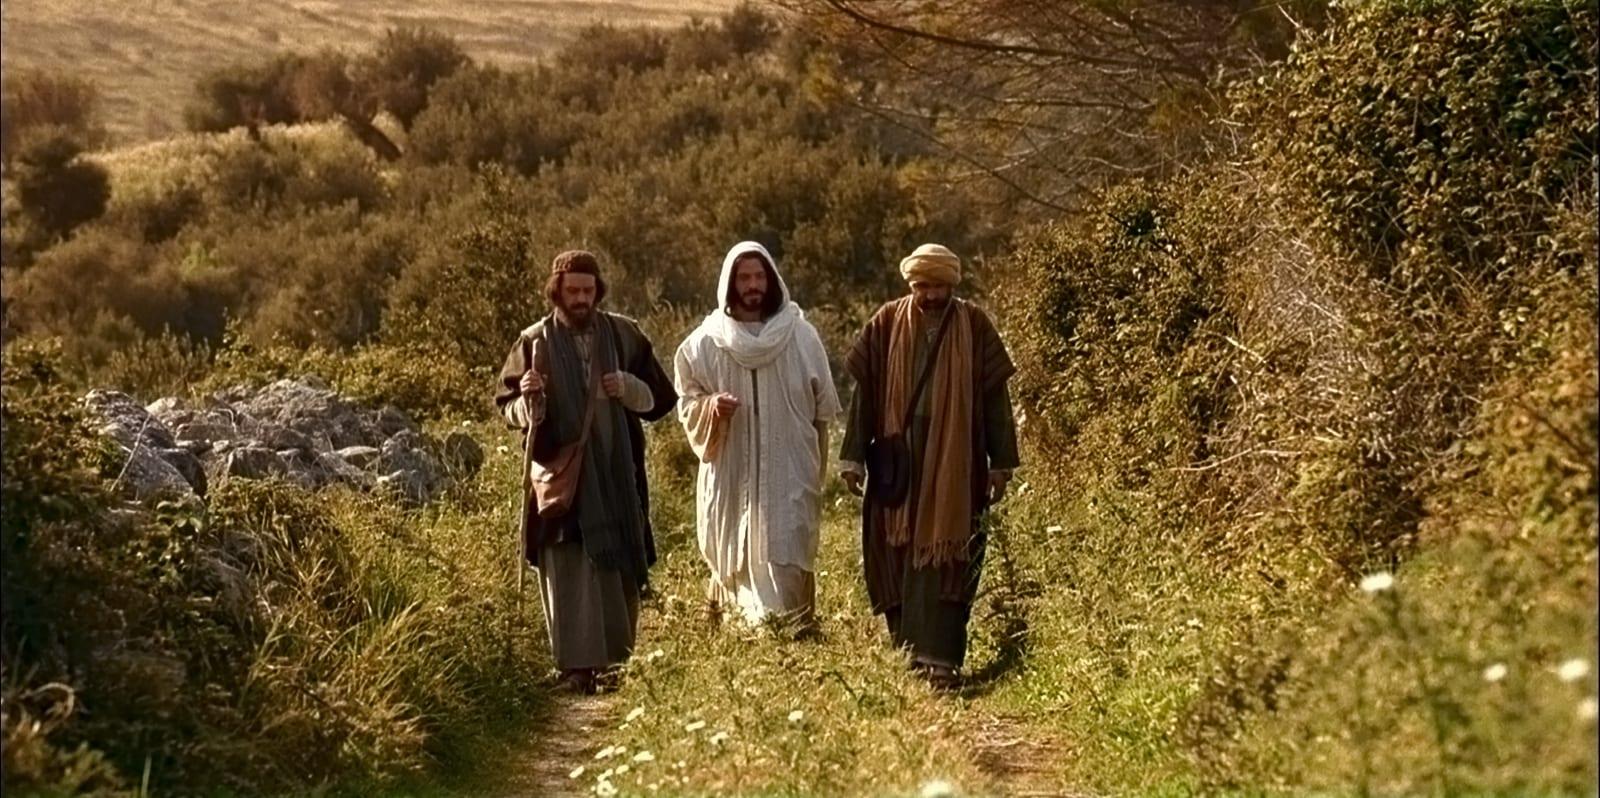 bible-videos-jesus-road-emmaus-1426536-print